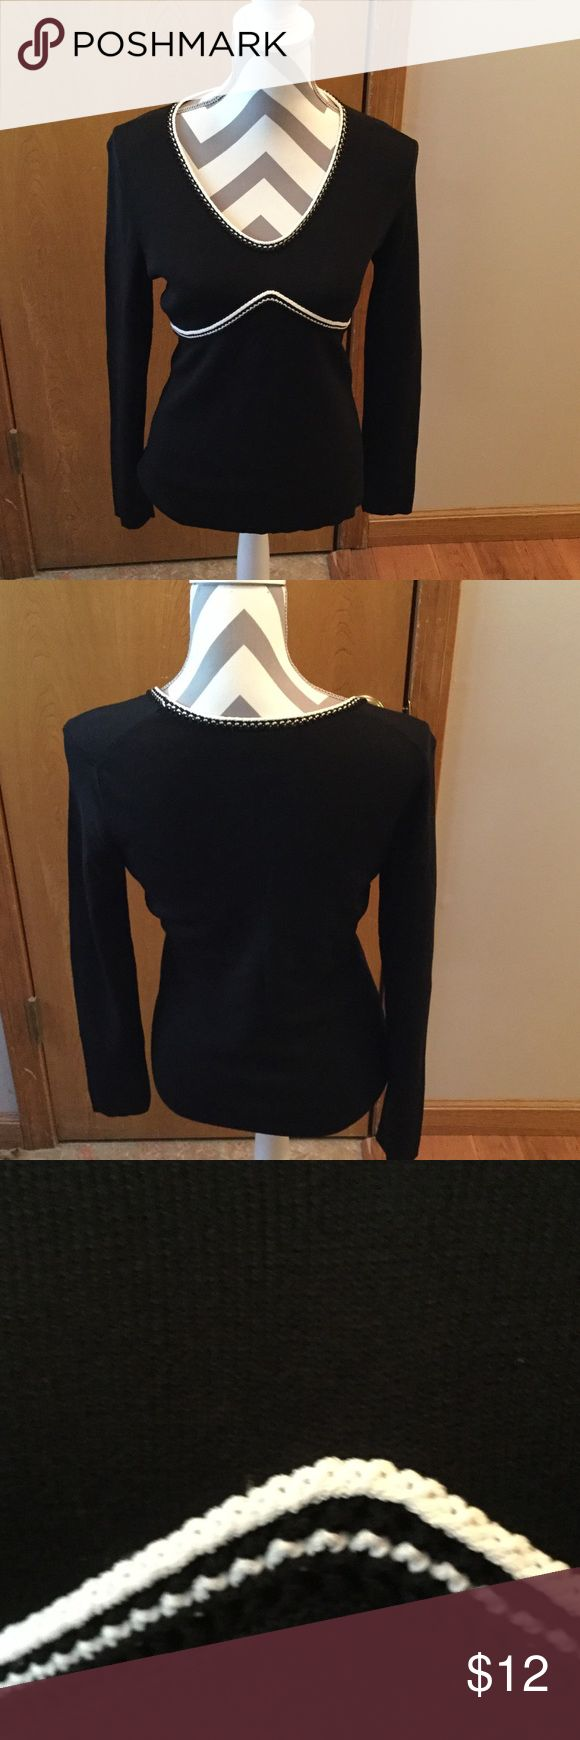 Anne Taylor Loft size Medium top 63 percent rayon. 37 percent nylon. Ann Taylor Loft Tops